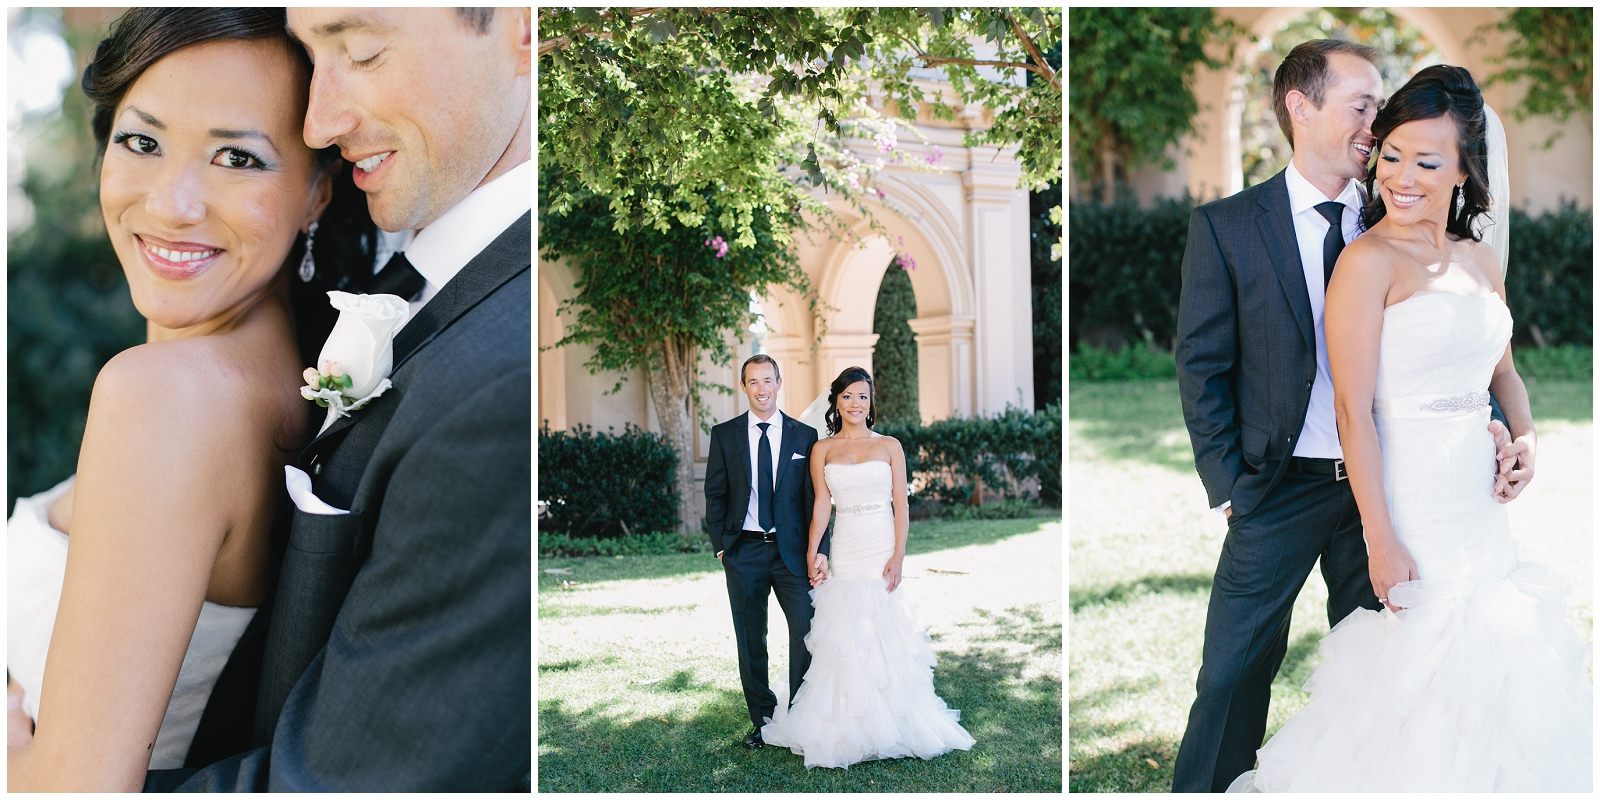 San-Francisco-Bay-Area-Wedding-Photography-Destination-8.jpg